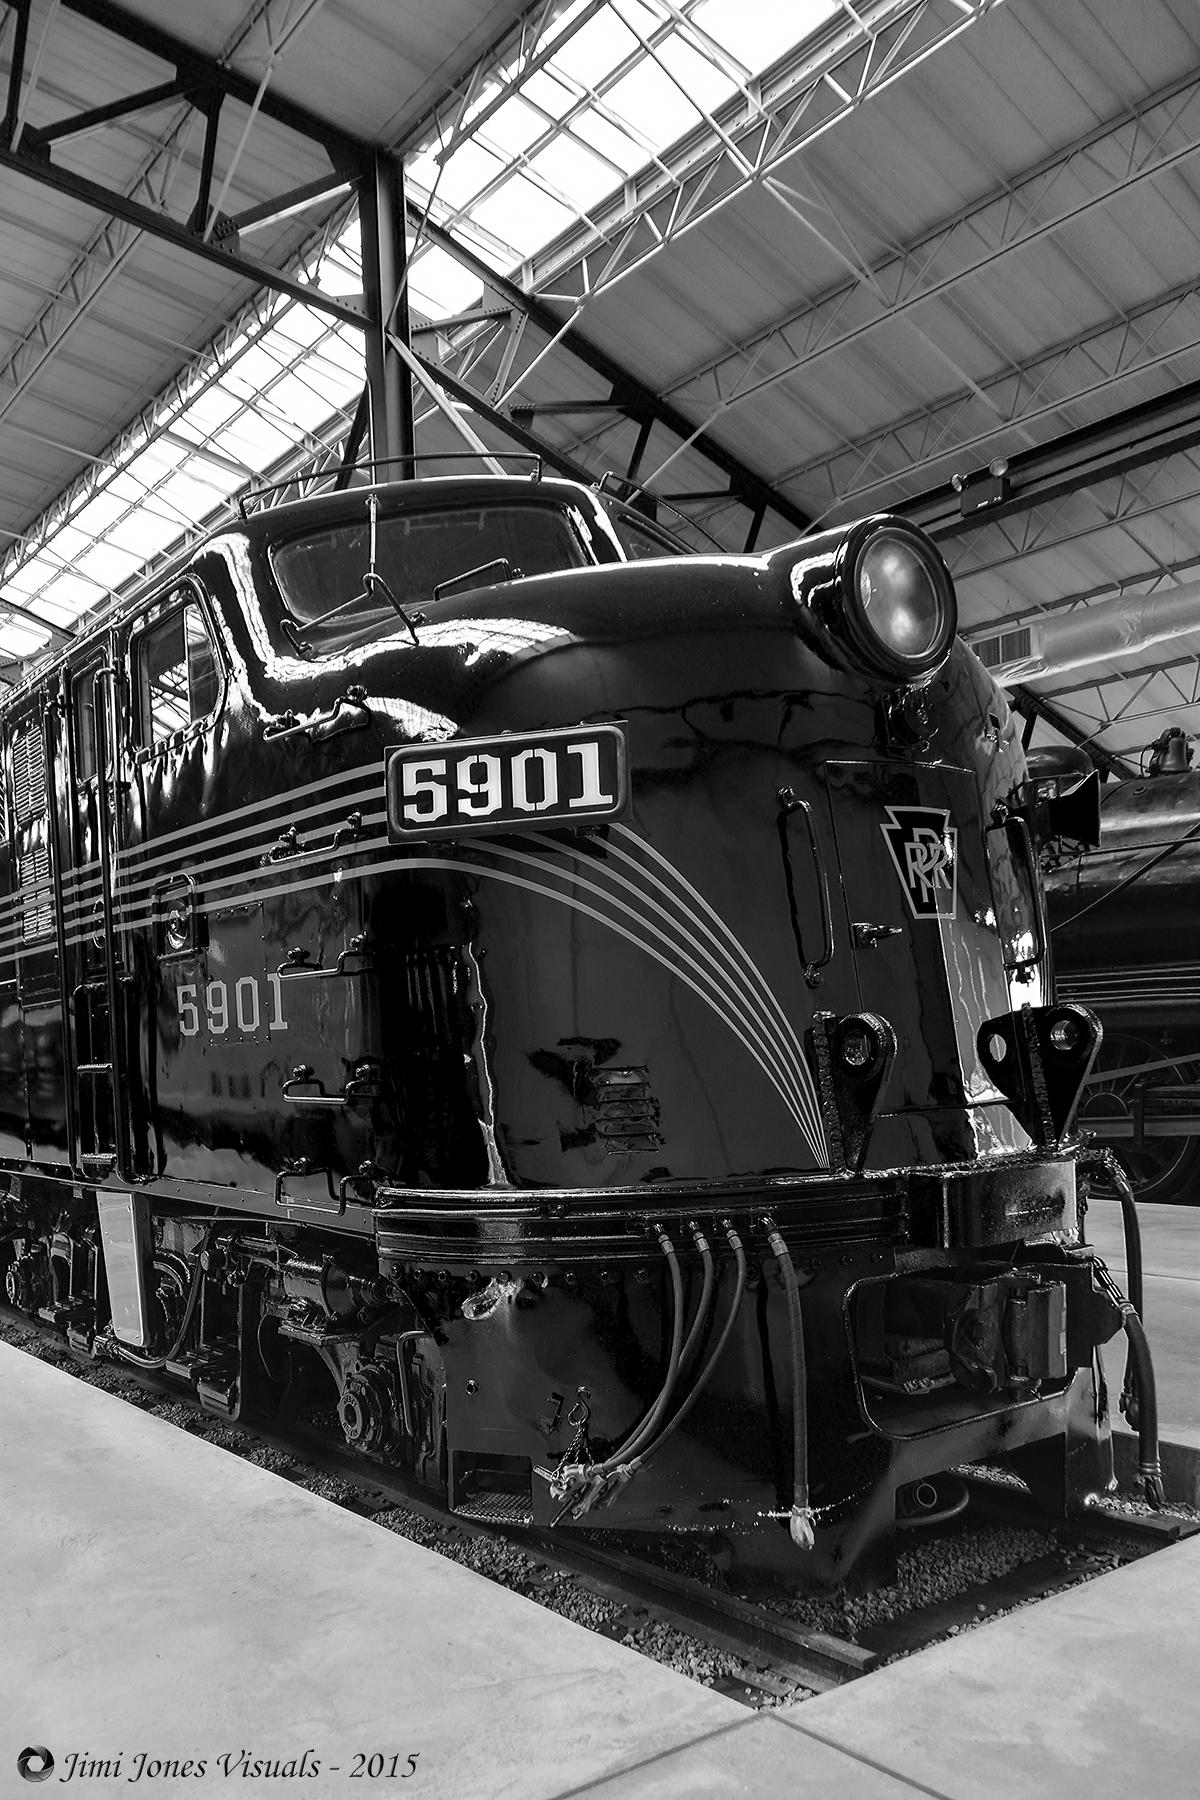 Pennsylvania Railroad 5901 - Front View in B&W